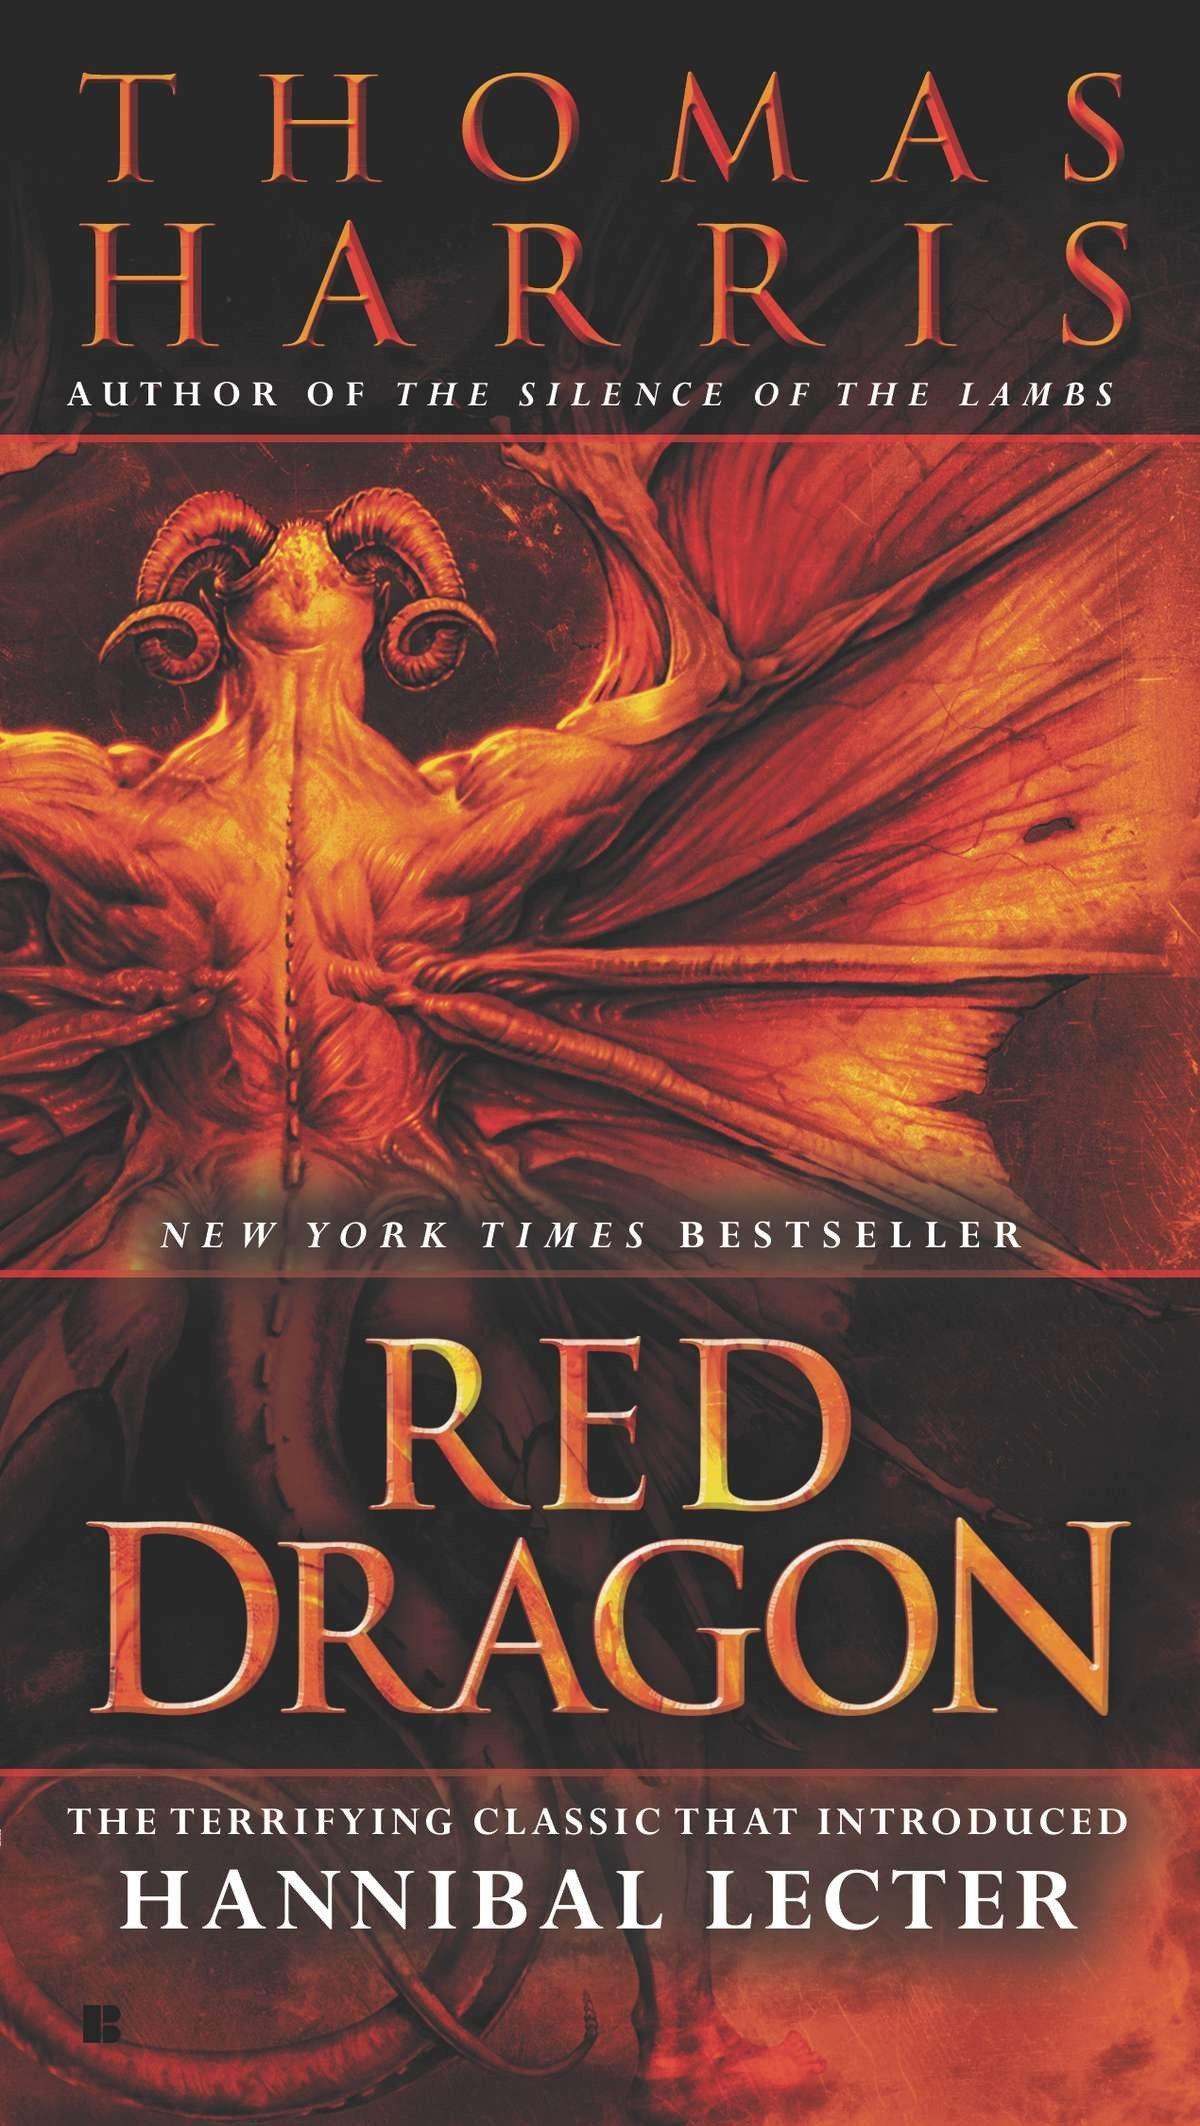 Amazon.com: Red Dragon (Hannibal Lecter Series) (9780425228227 ...